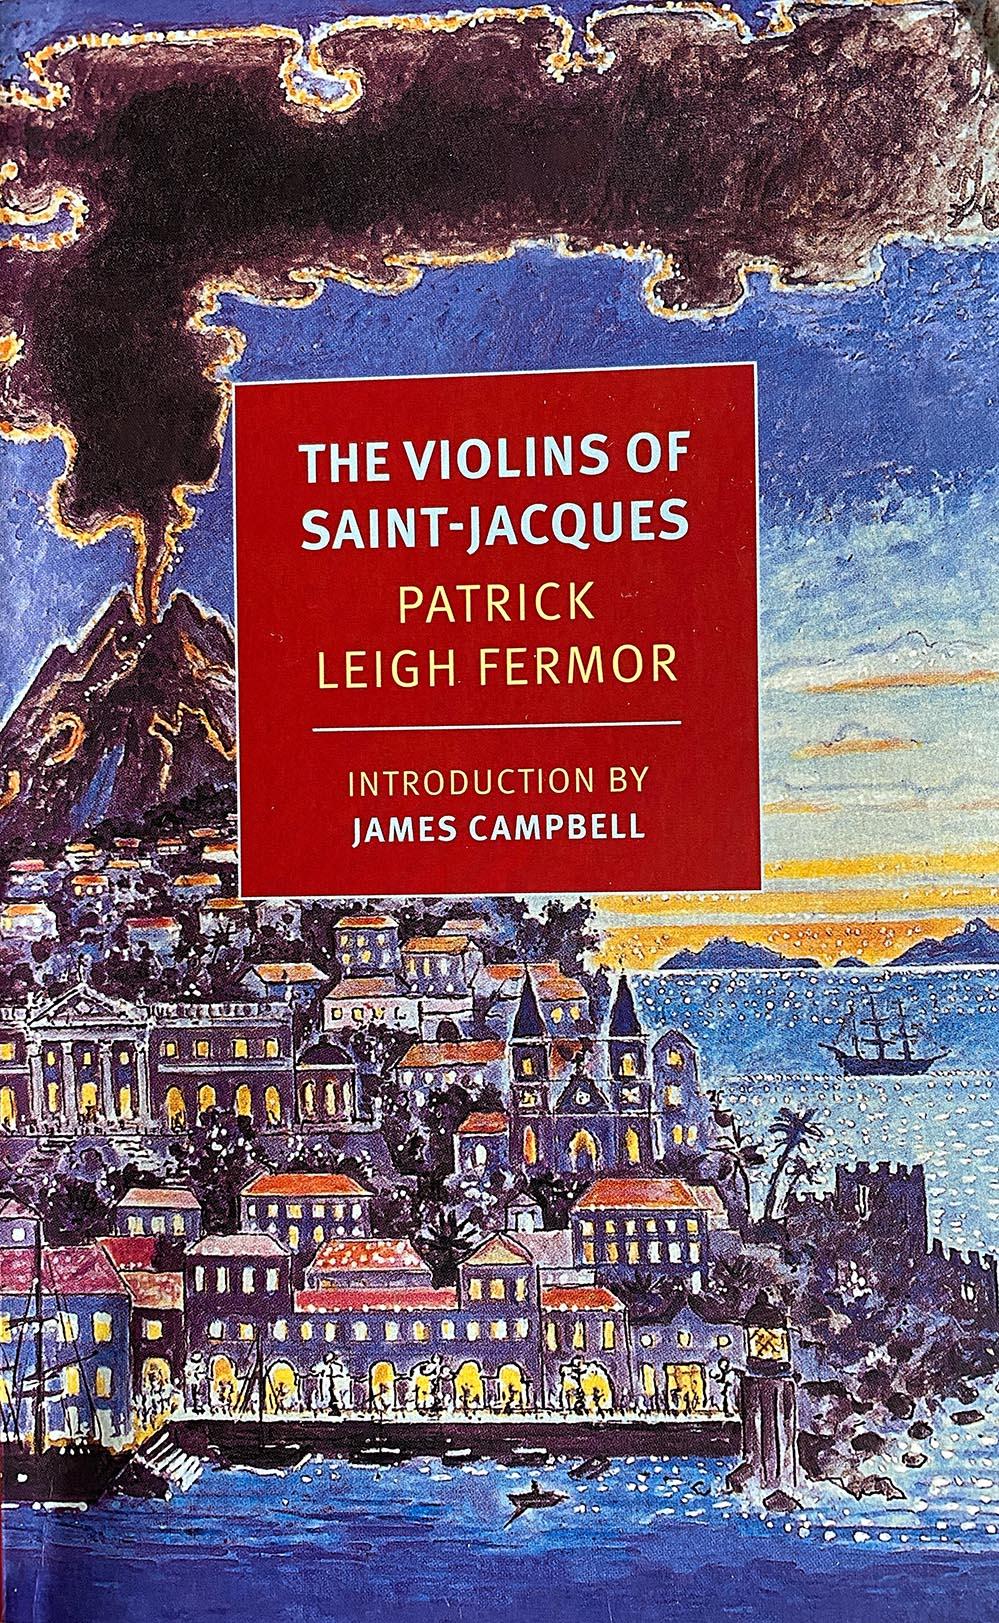 The Violins of Saint Jacques